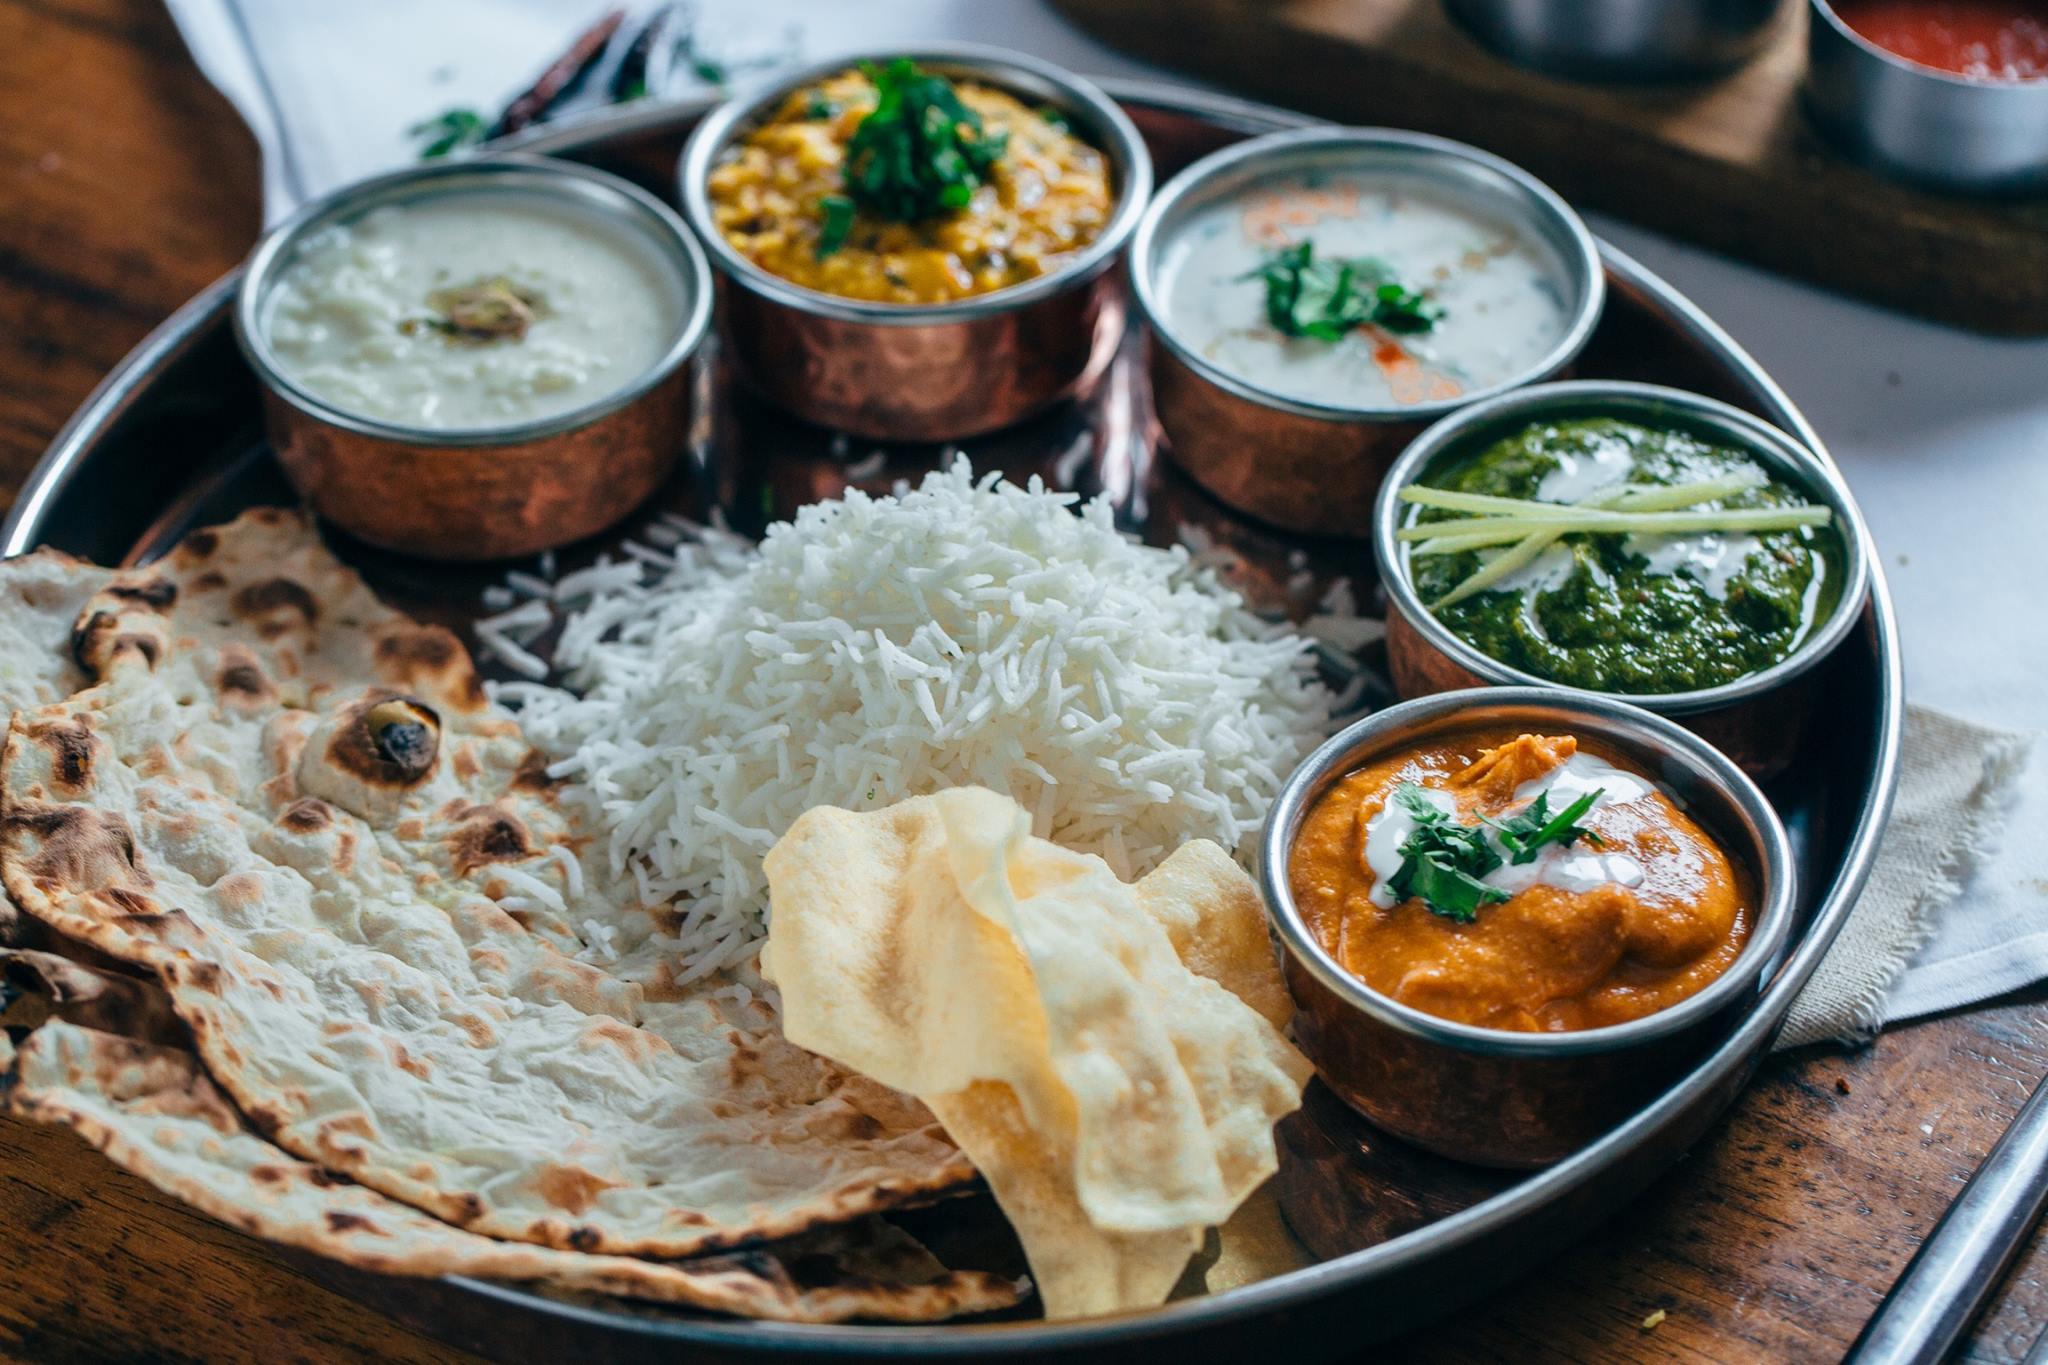 Thali Lunch from Indian Restaurant Merchant City Glasgow